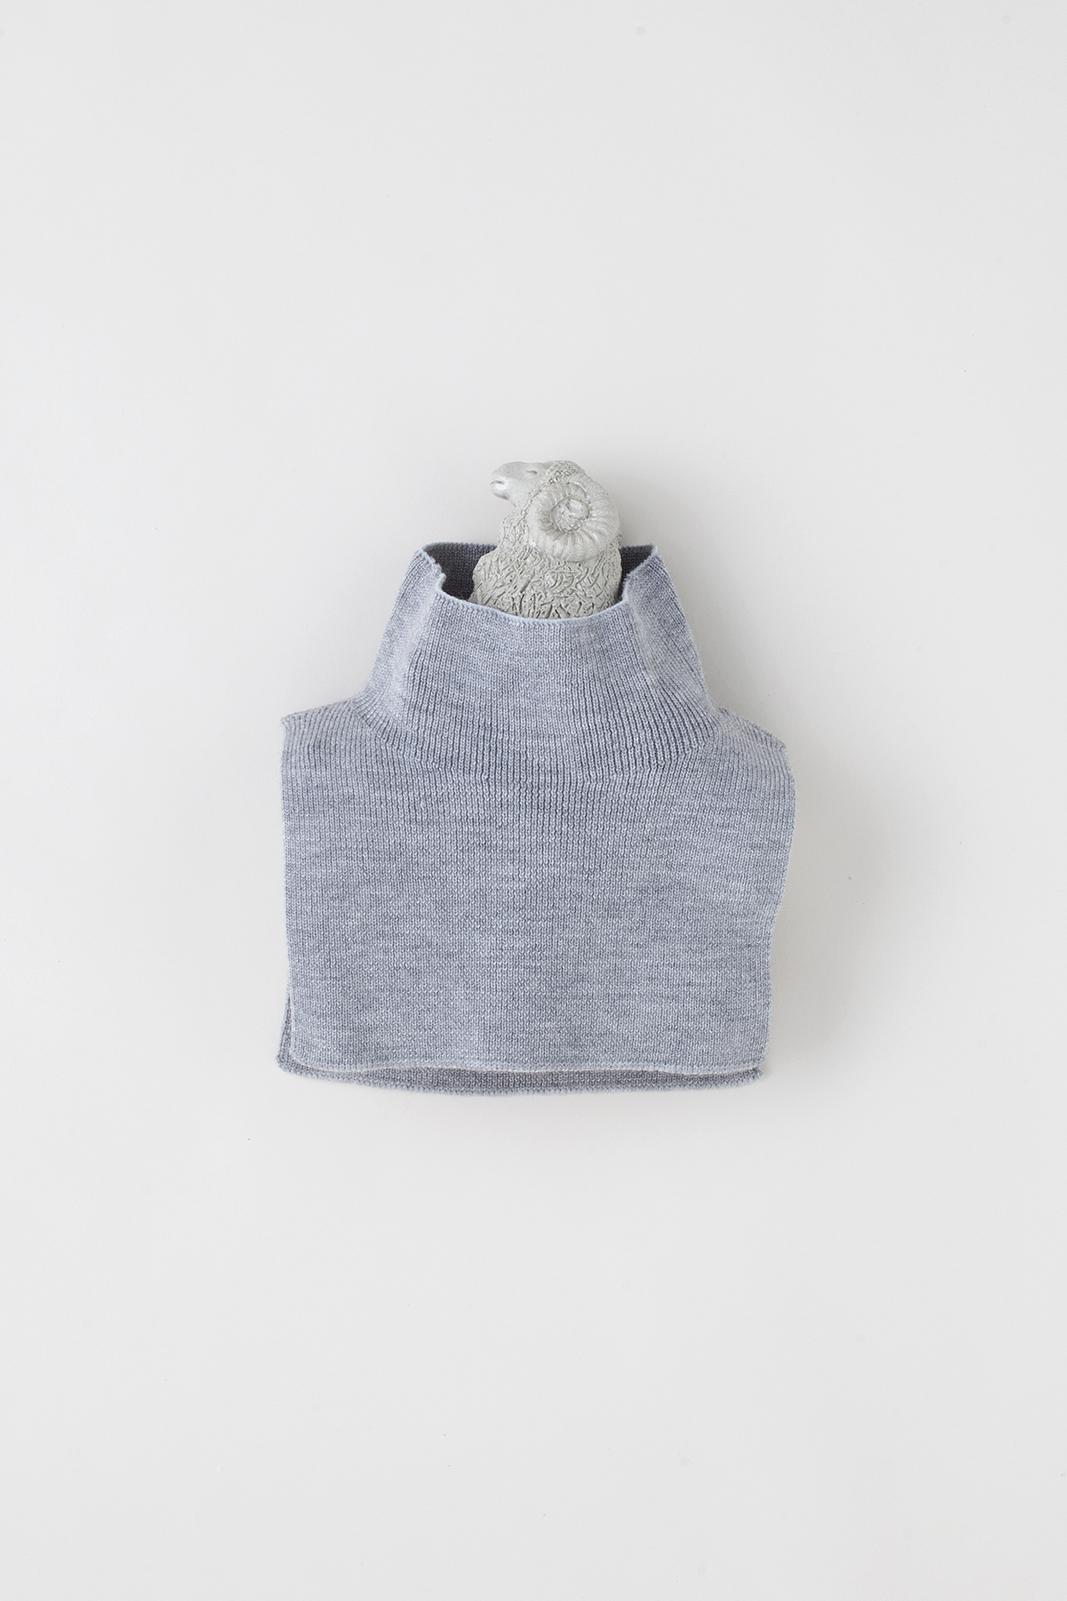 Camphor カンフル kids こども 子供服 neckwarmer 日本製 madeinjapan